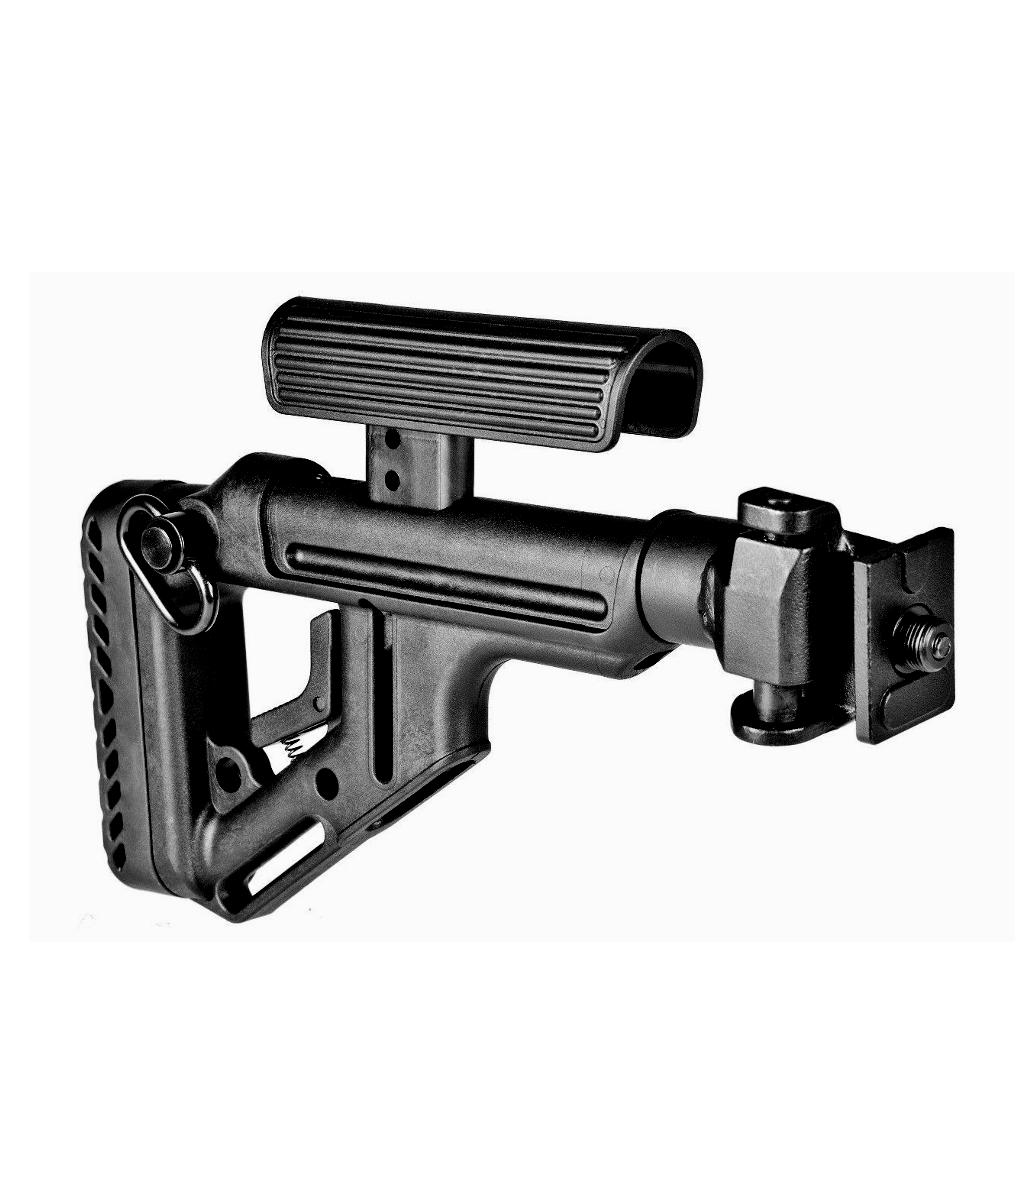 Fab Defense VZ-58 Butt Stock With Cheek Piece & Folding Metal Joint UAS-VZ